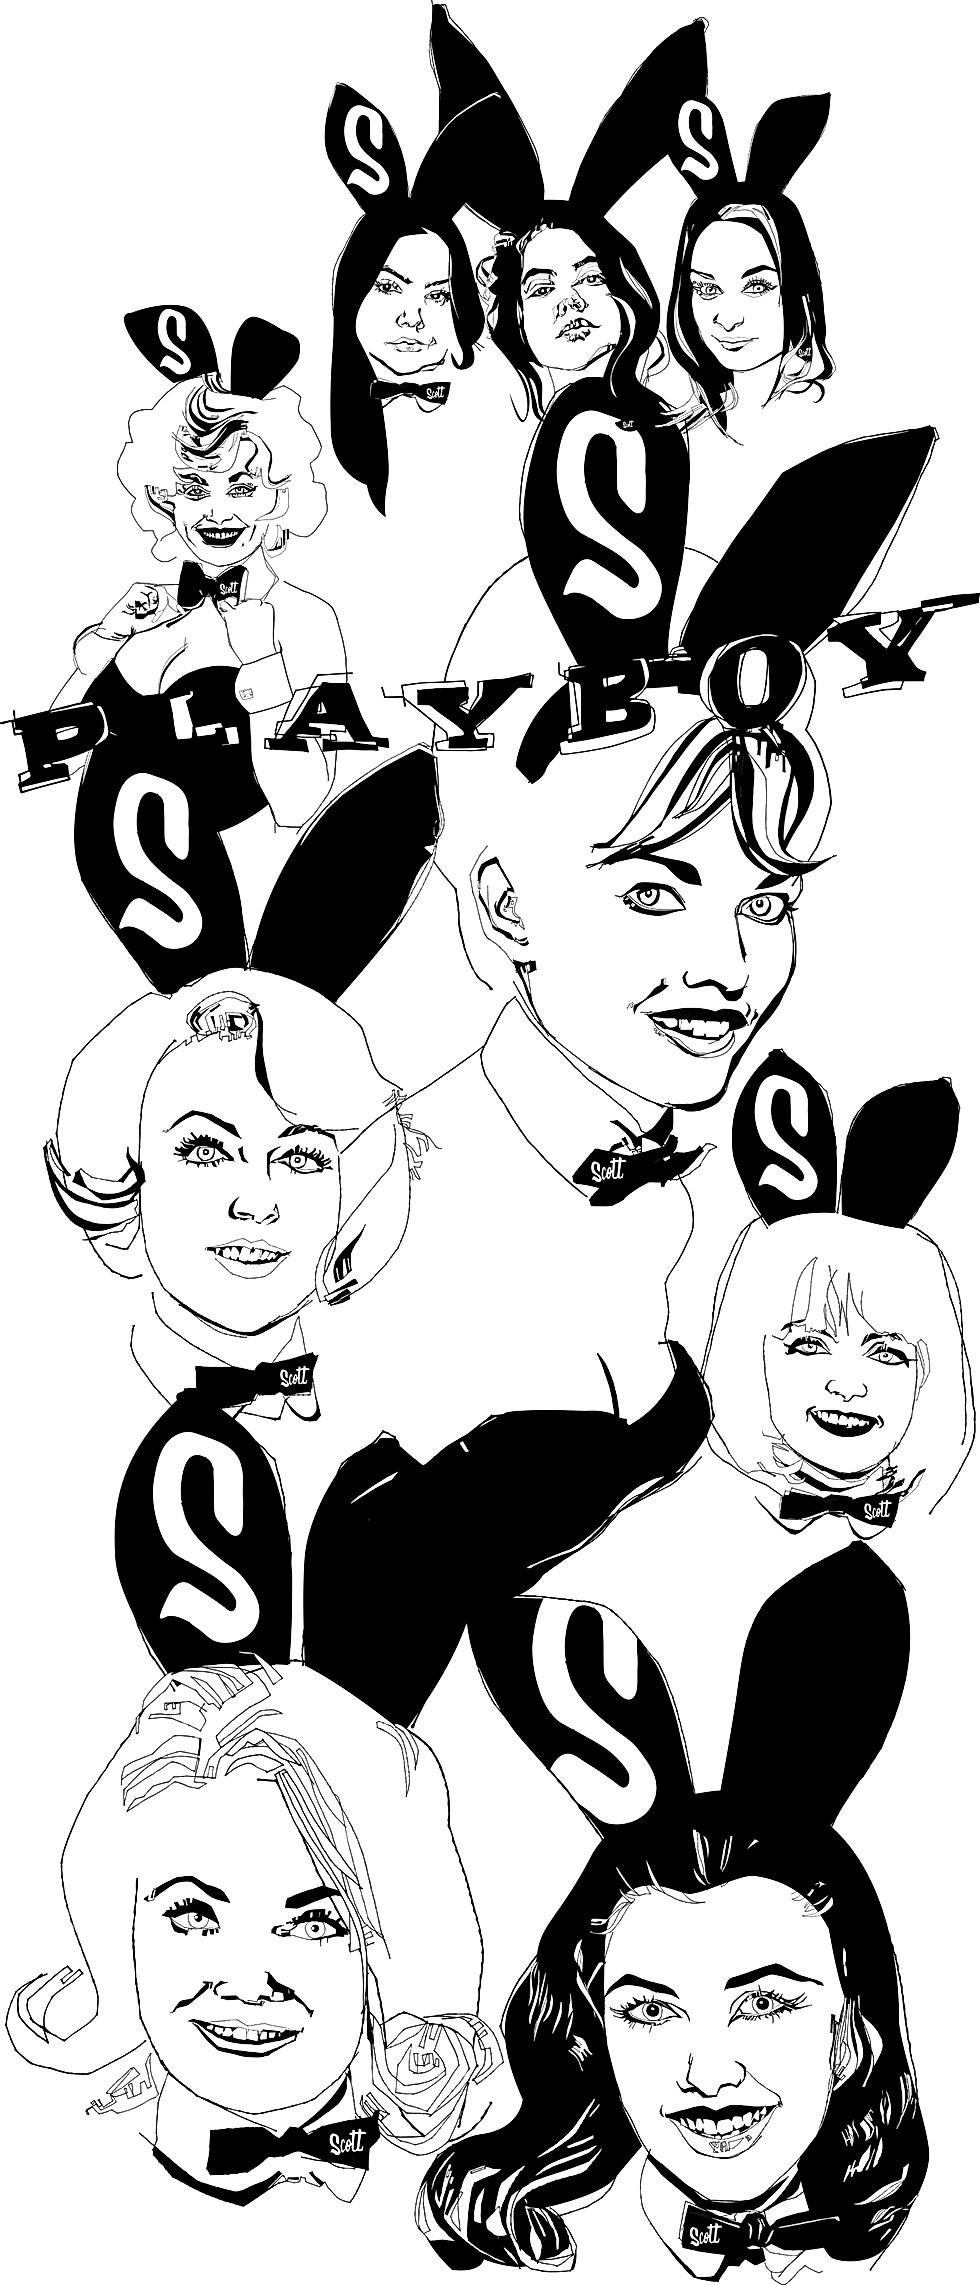 PLAYBOY-BUNNY_group-1.jpg